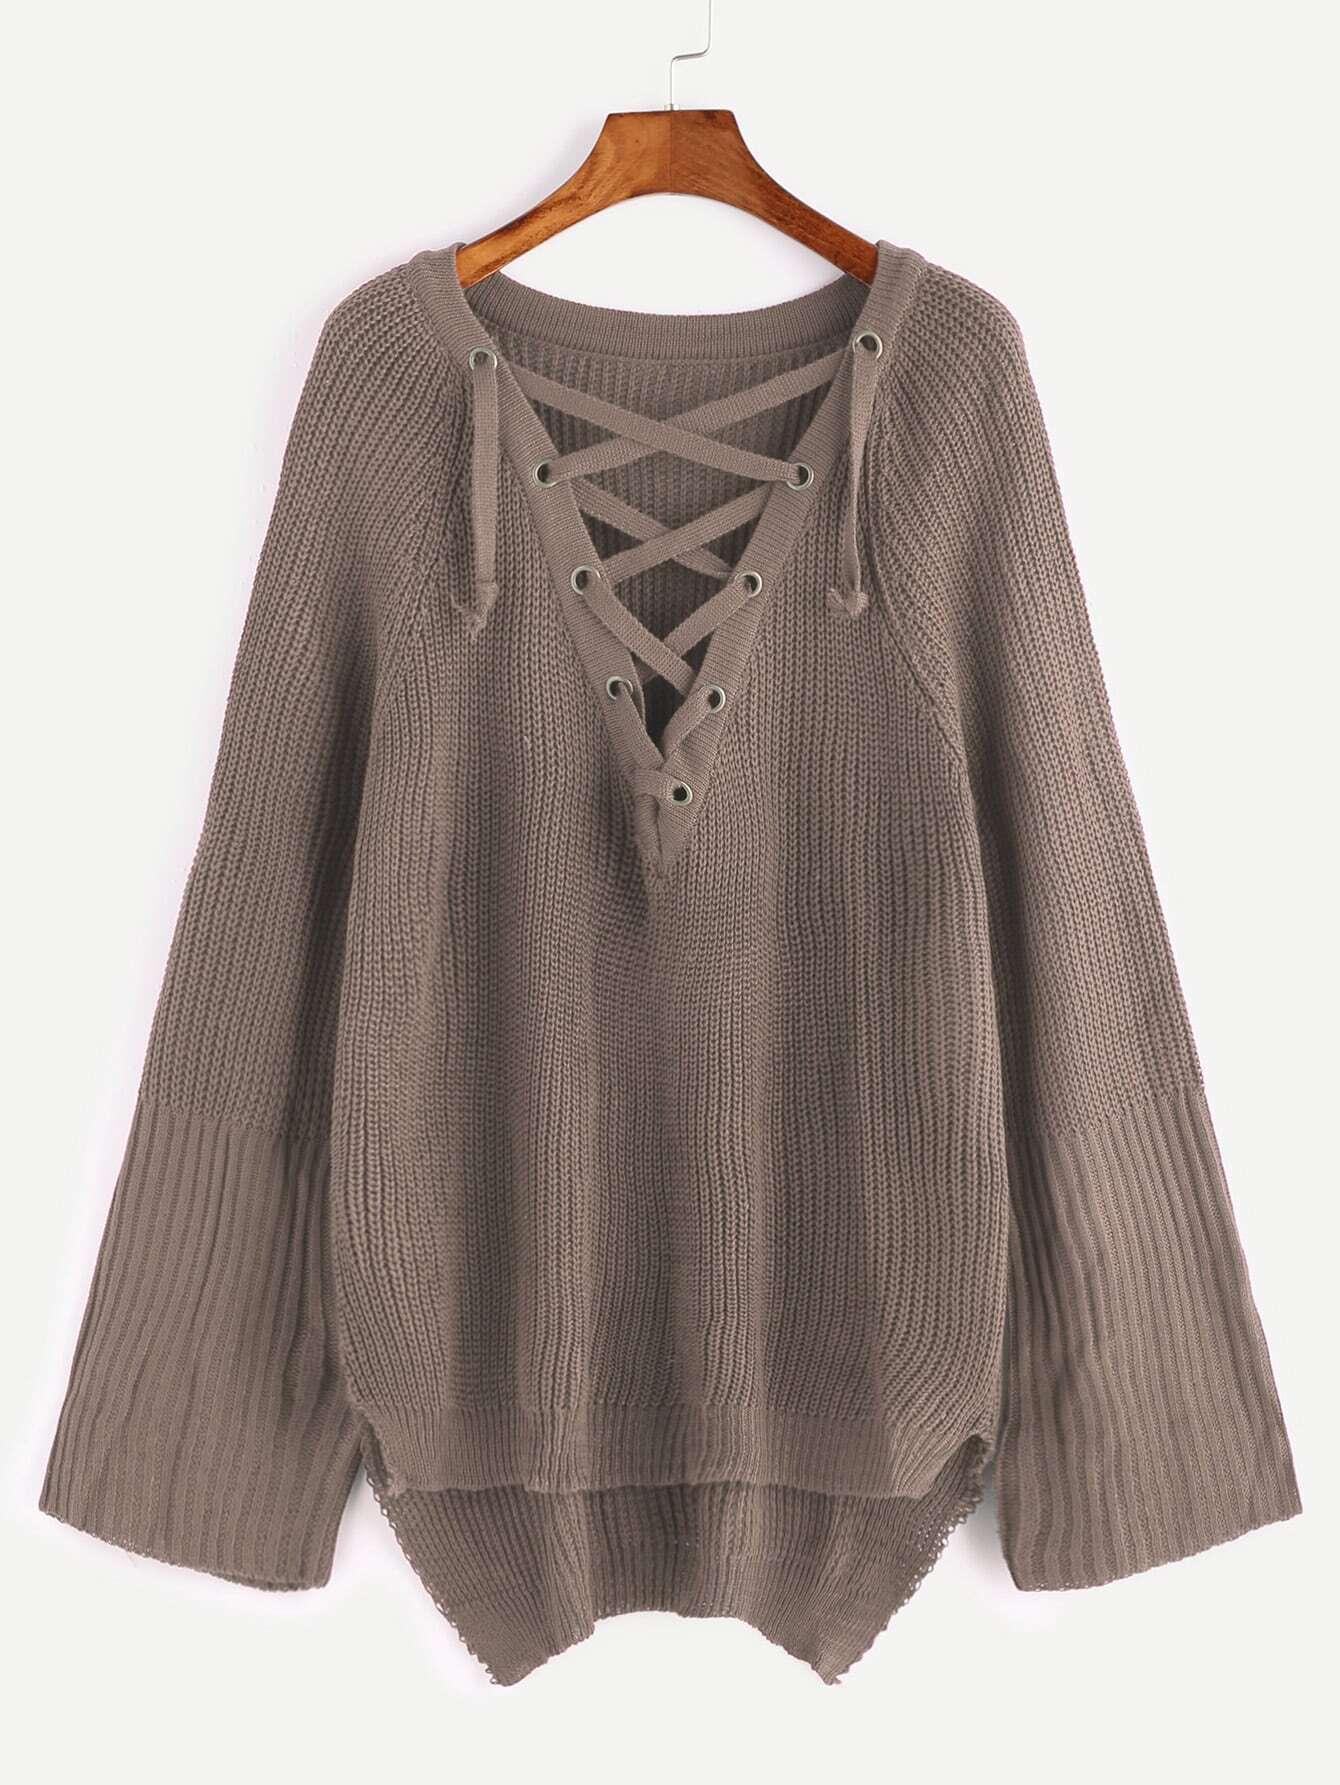 Khaki Eyelet Lace Up Slit Side High Low Sweater sweater161219301